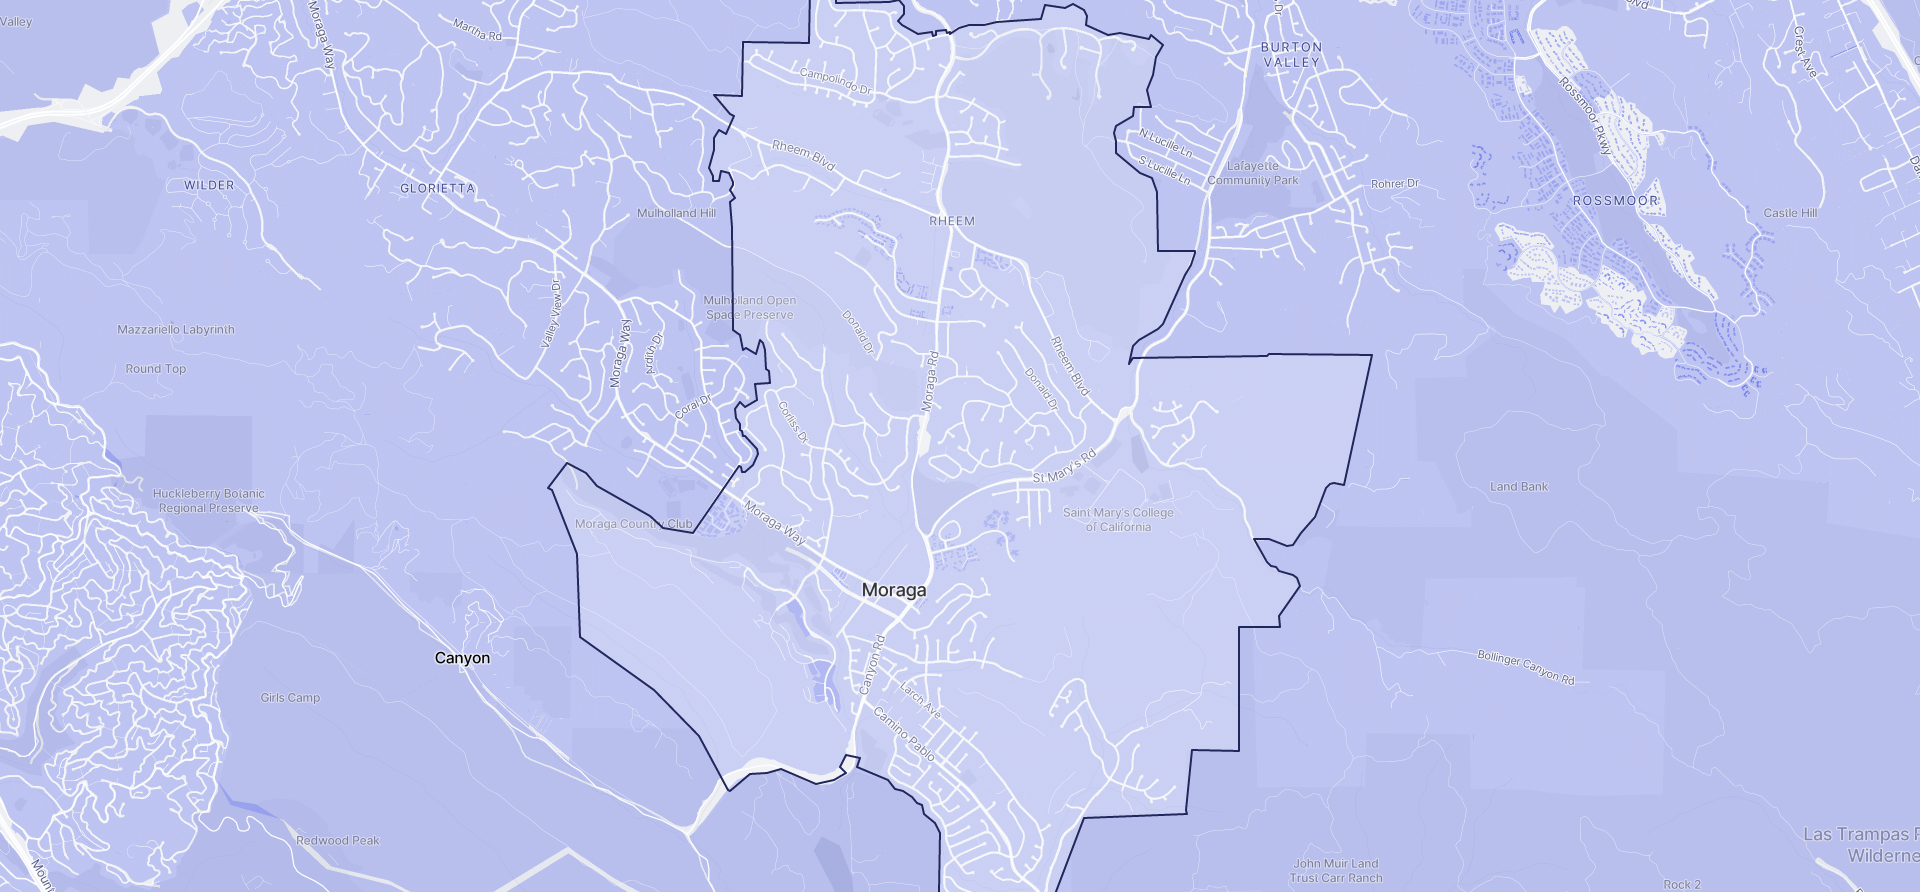 Image of Moraga boundaries on a map.